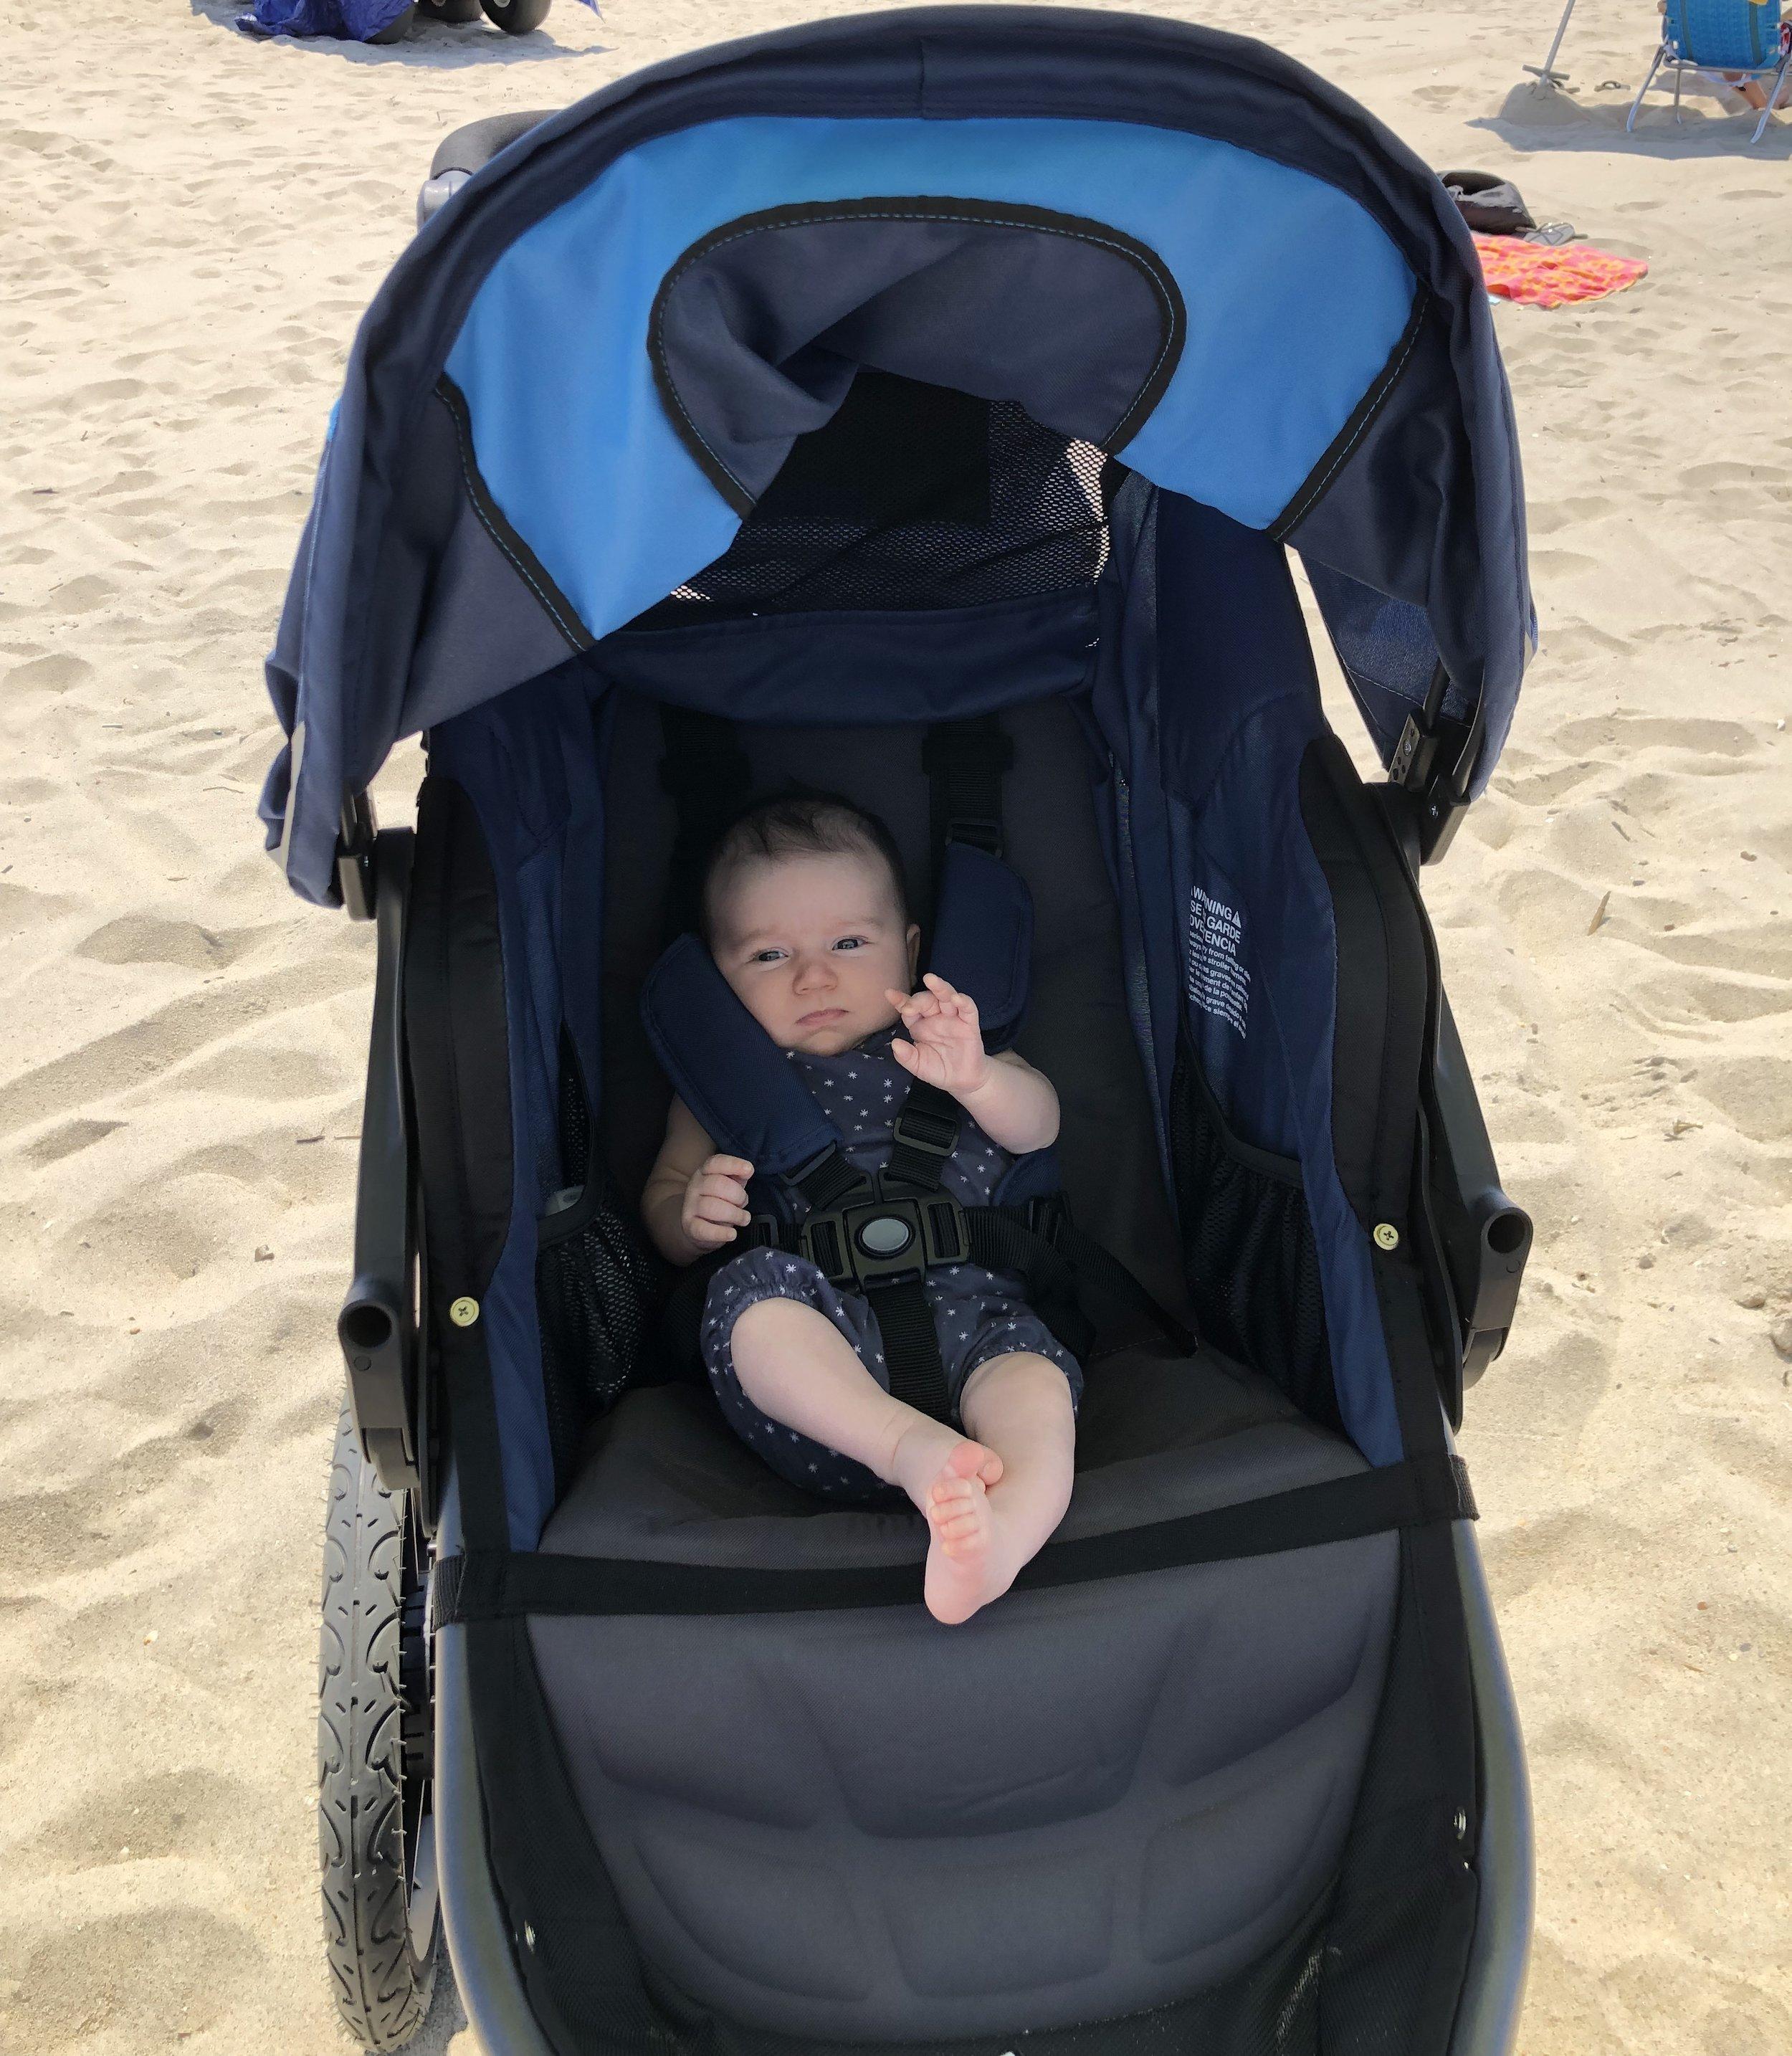 bob revolution 3.0 jogging stroller with newborn